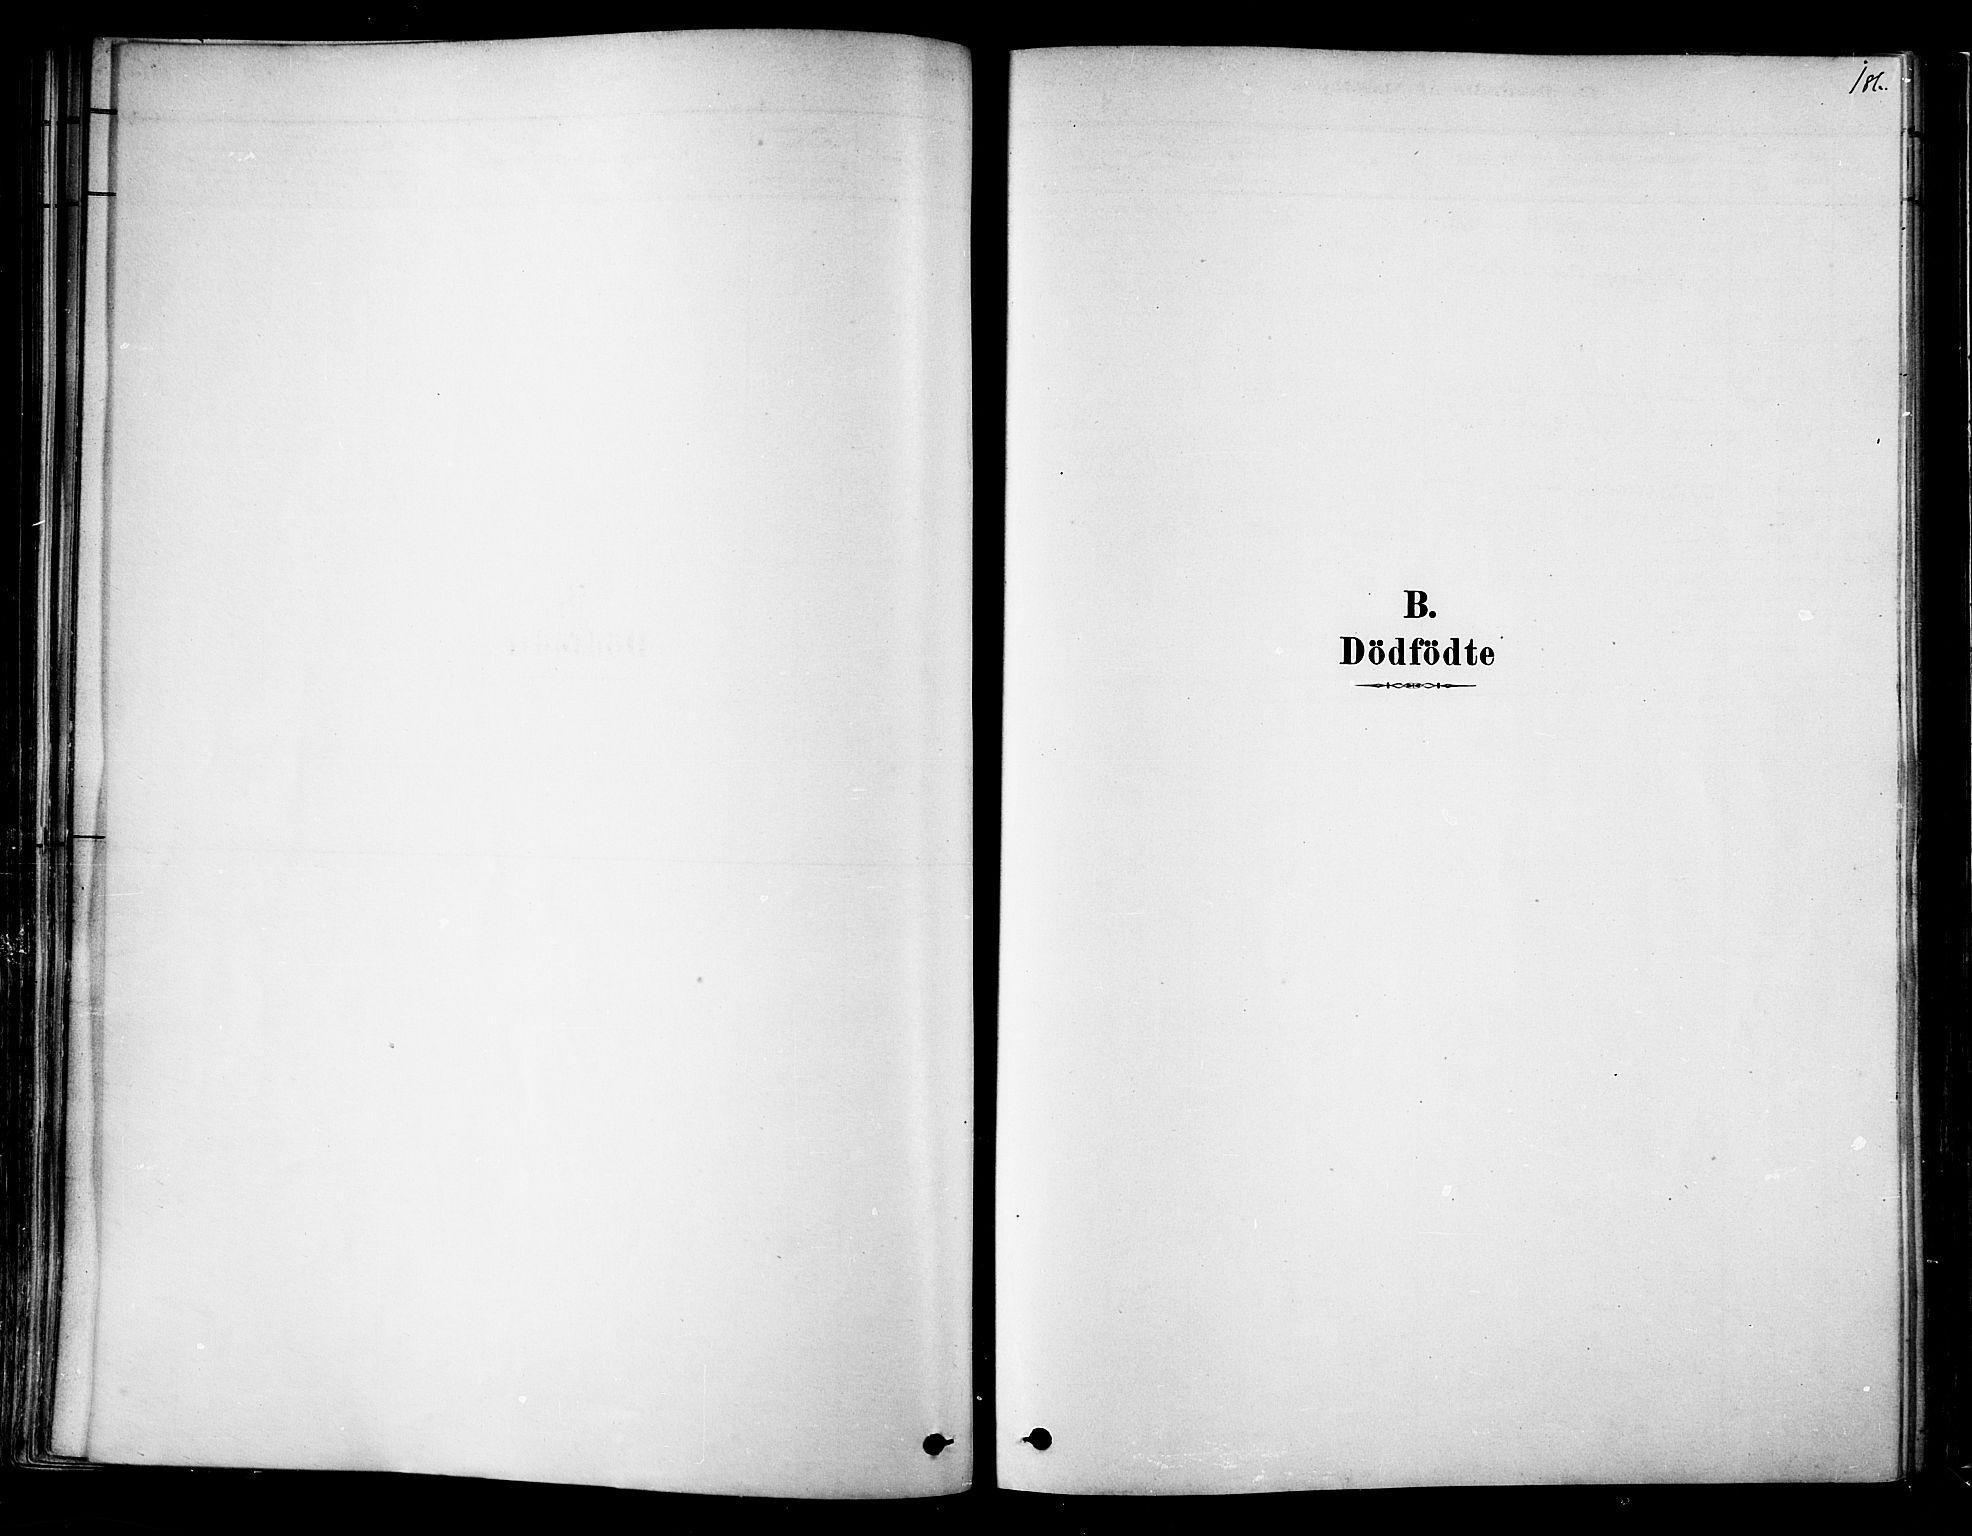 SAT, Ministerialprotokoller, klokkerbøker og fødselsregistre - Nordland, 834/L0507: Ministerialbok nr. 834A05, 1878-1892, s. 186